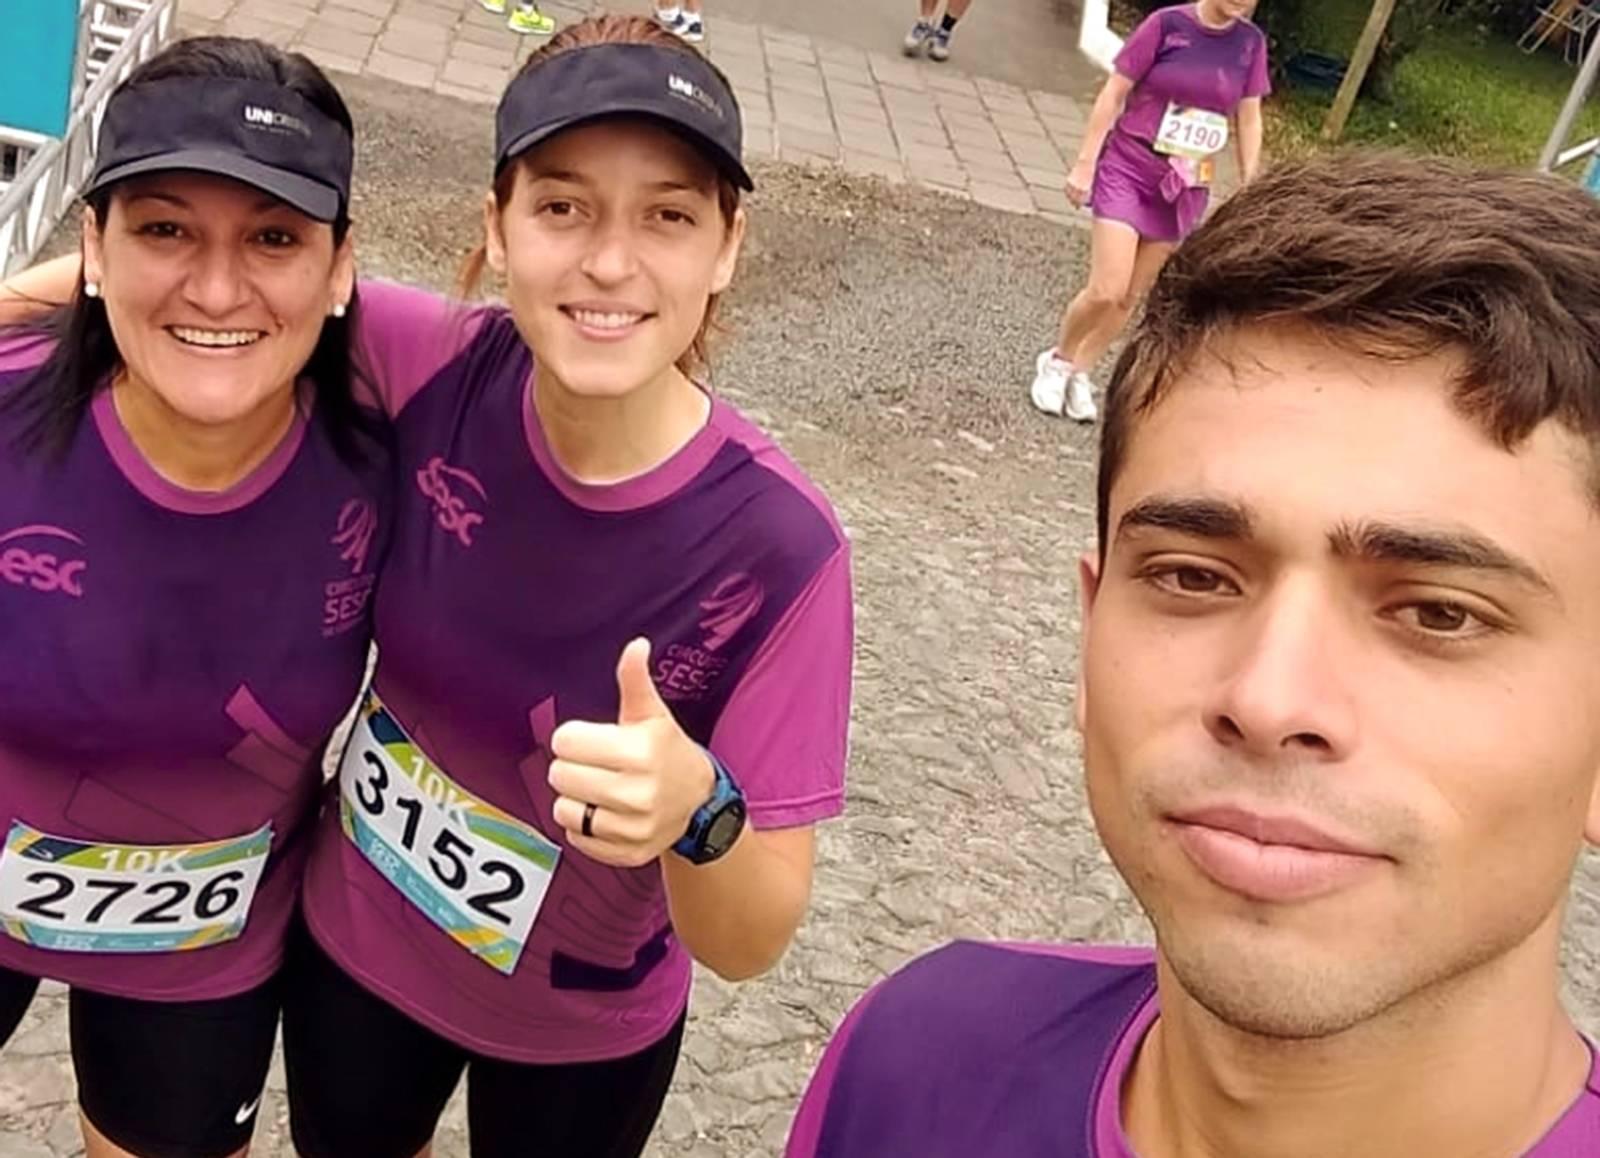 Atletas de Roque participam de finais de corrida do Sesc